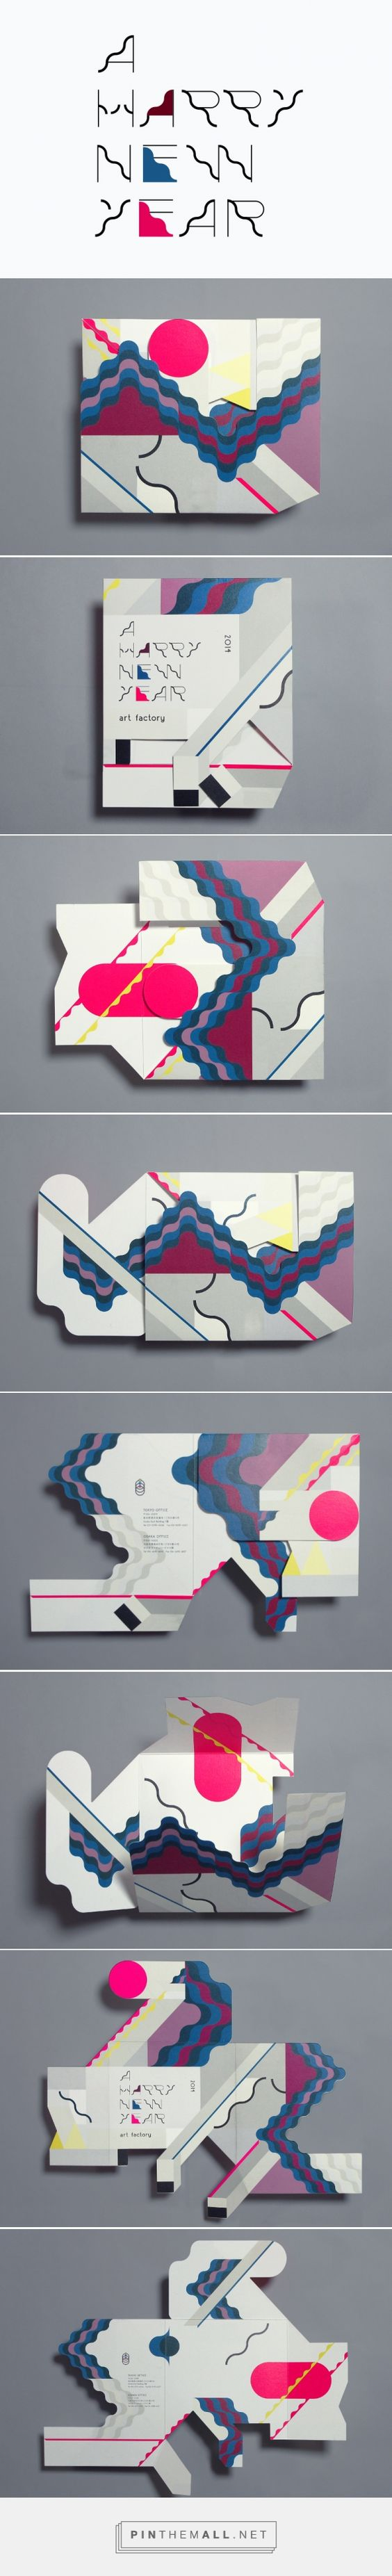 A HAPPY NEW YEAR art factory / Naonori Yago / 矢後直規 -  http://www.naonoriyago.com/portfolio/171